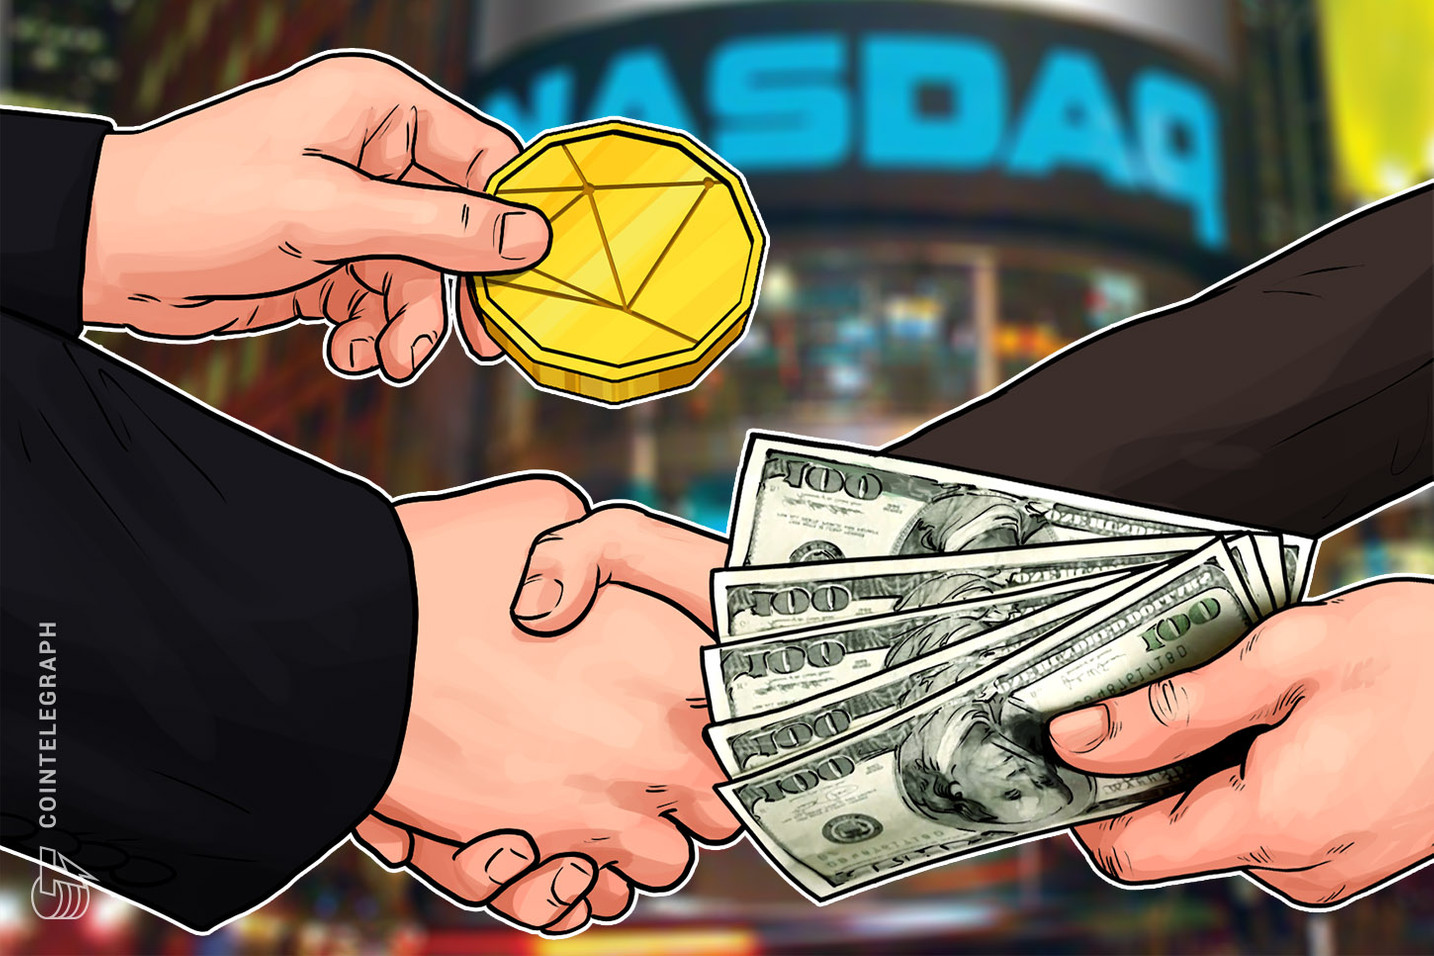 Kryptobörse ErisX erhält 27,5 Mio. US-Dollar Investitionskapital